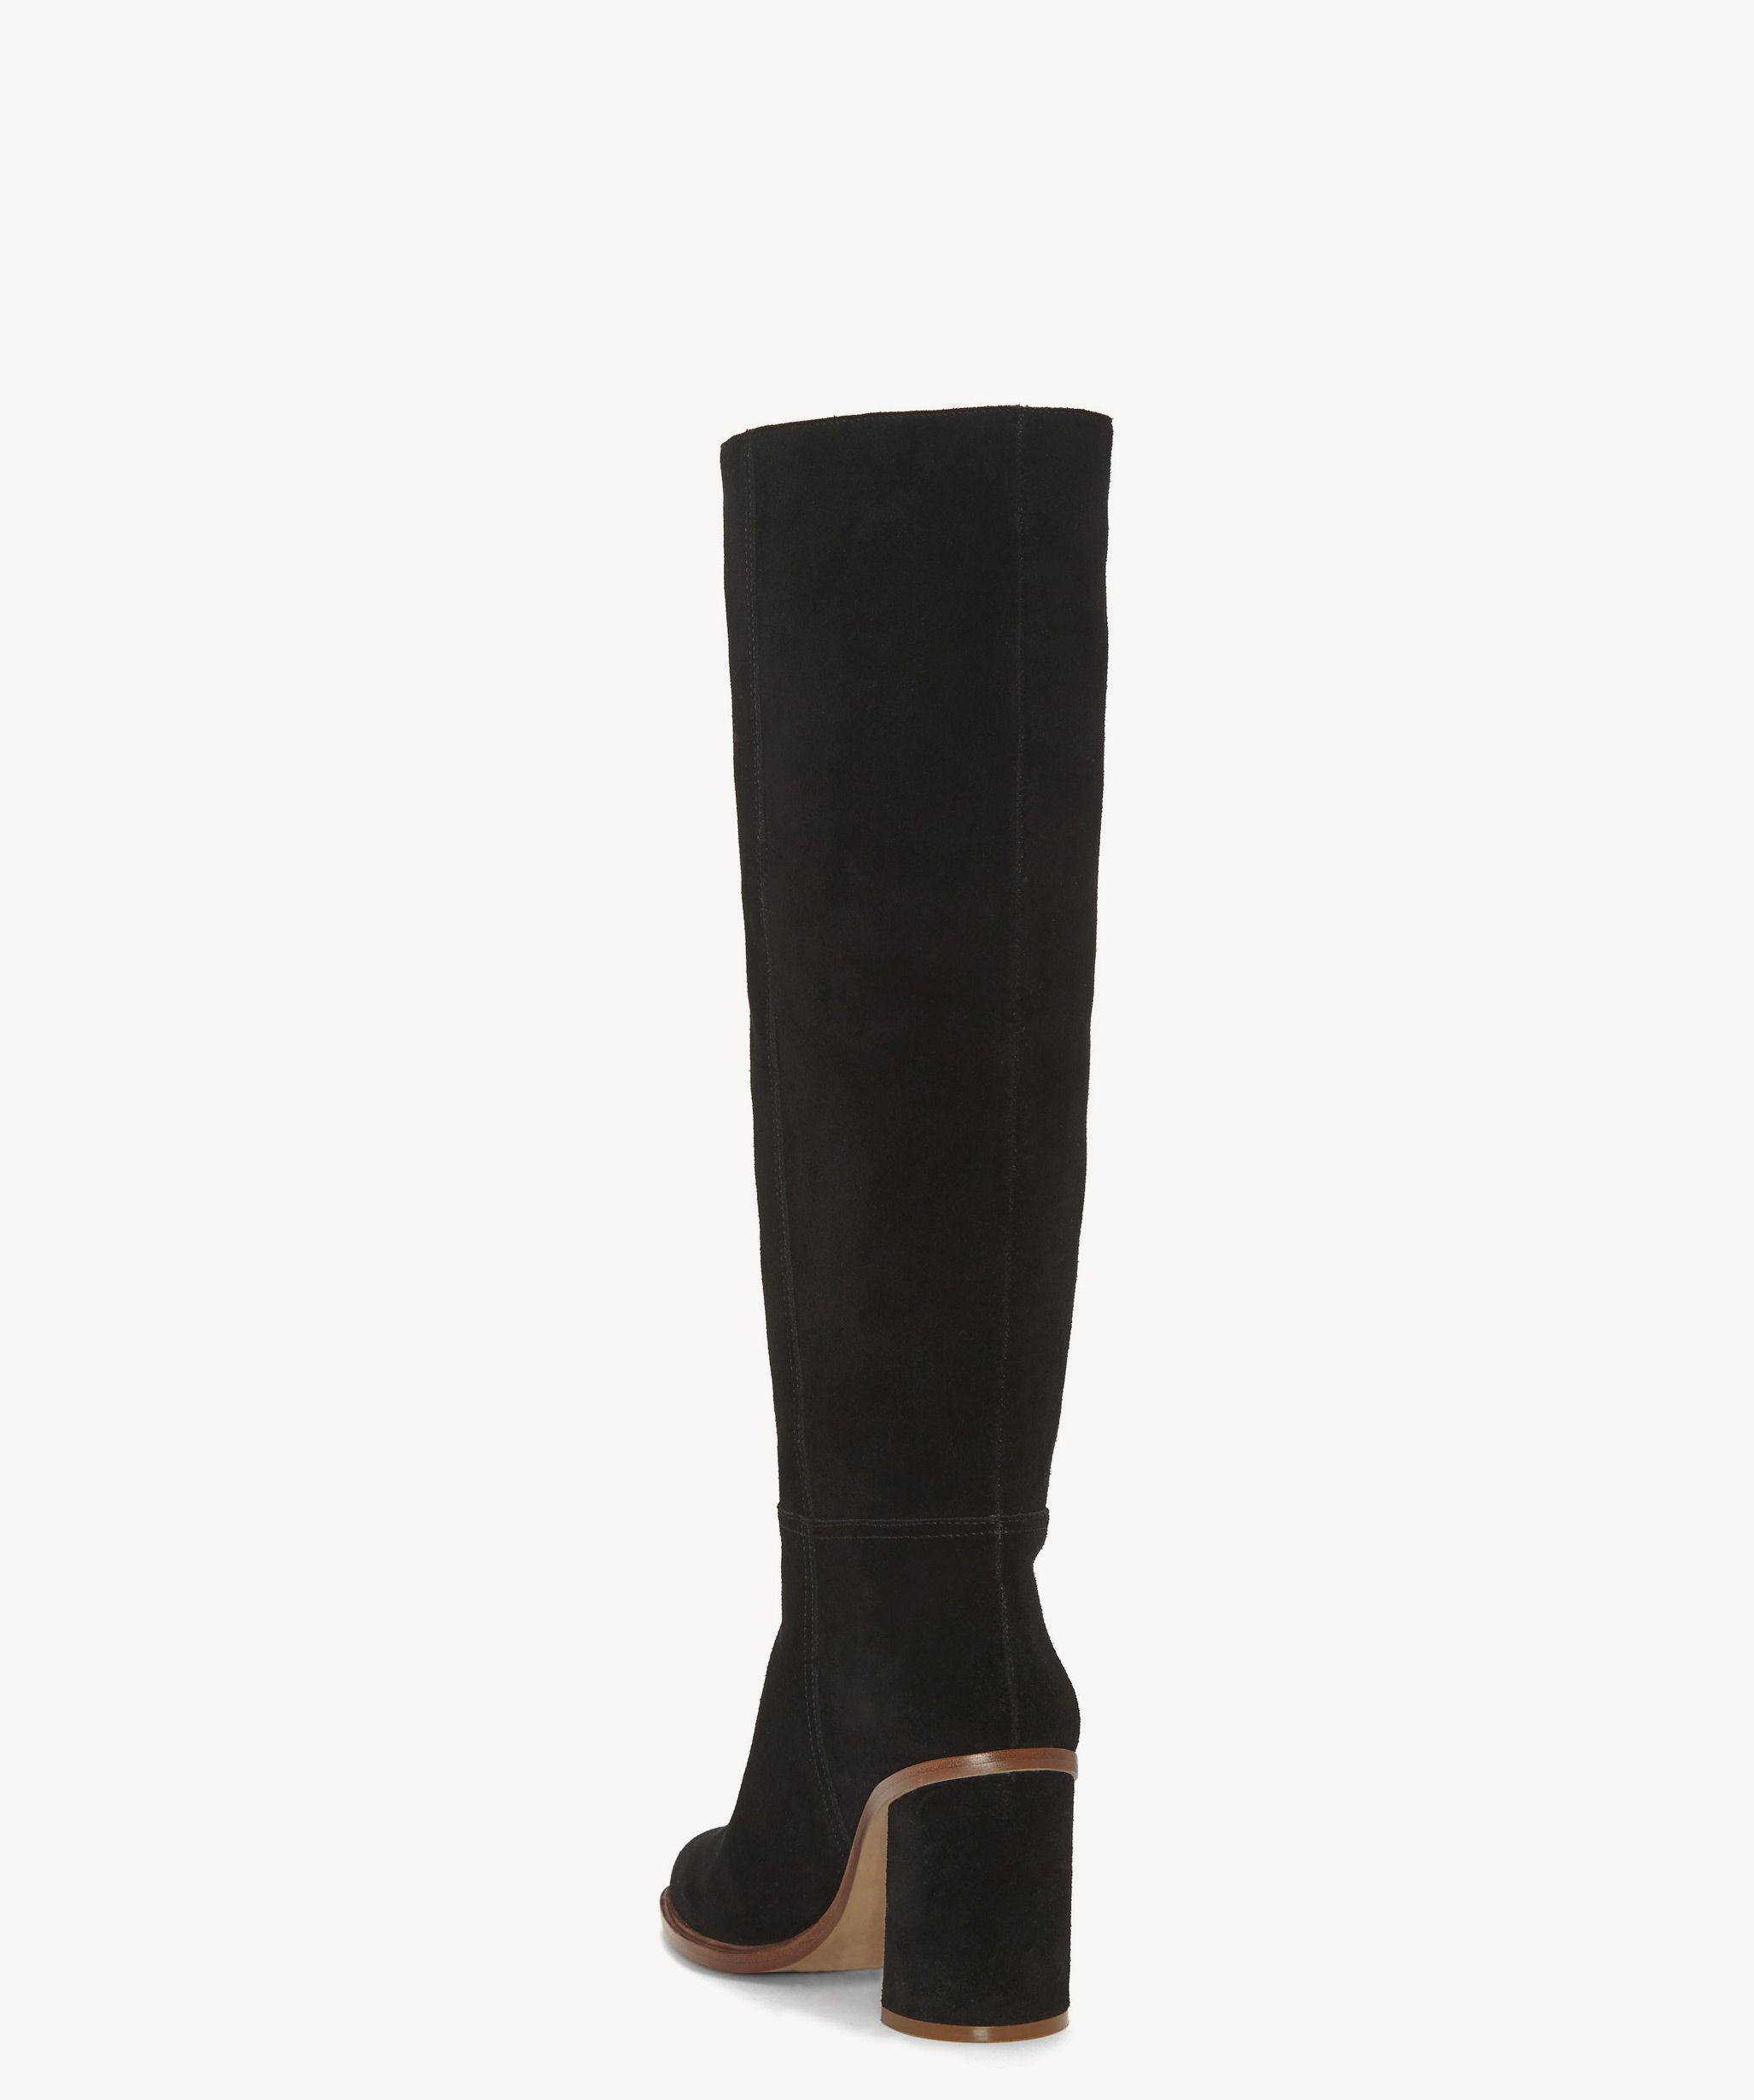 Vince-Camuto-DAMEERA-Knee-High-Block-Heel-Fashion-Dress-Boots thumbnail 4